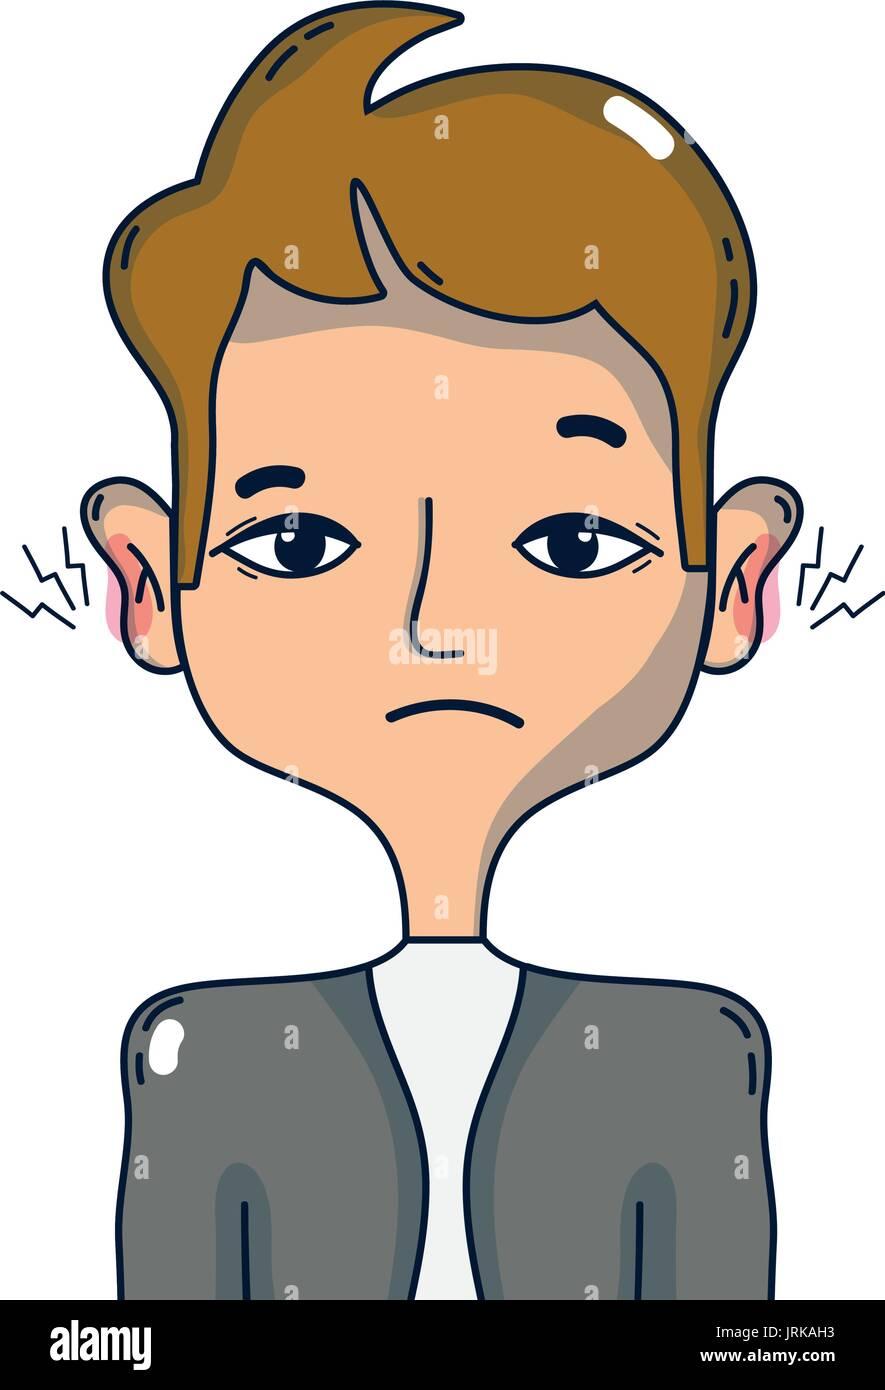 man with otitis earache illness infection - Stock Image